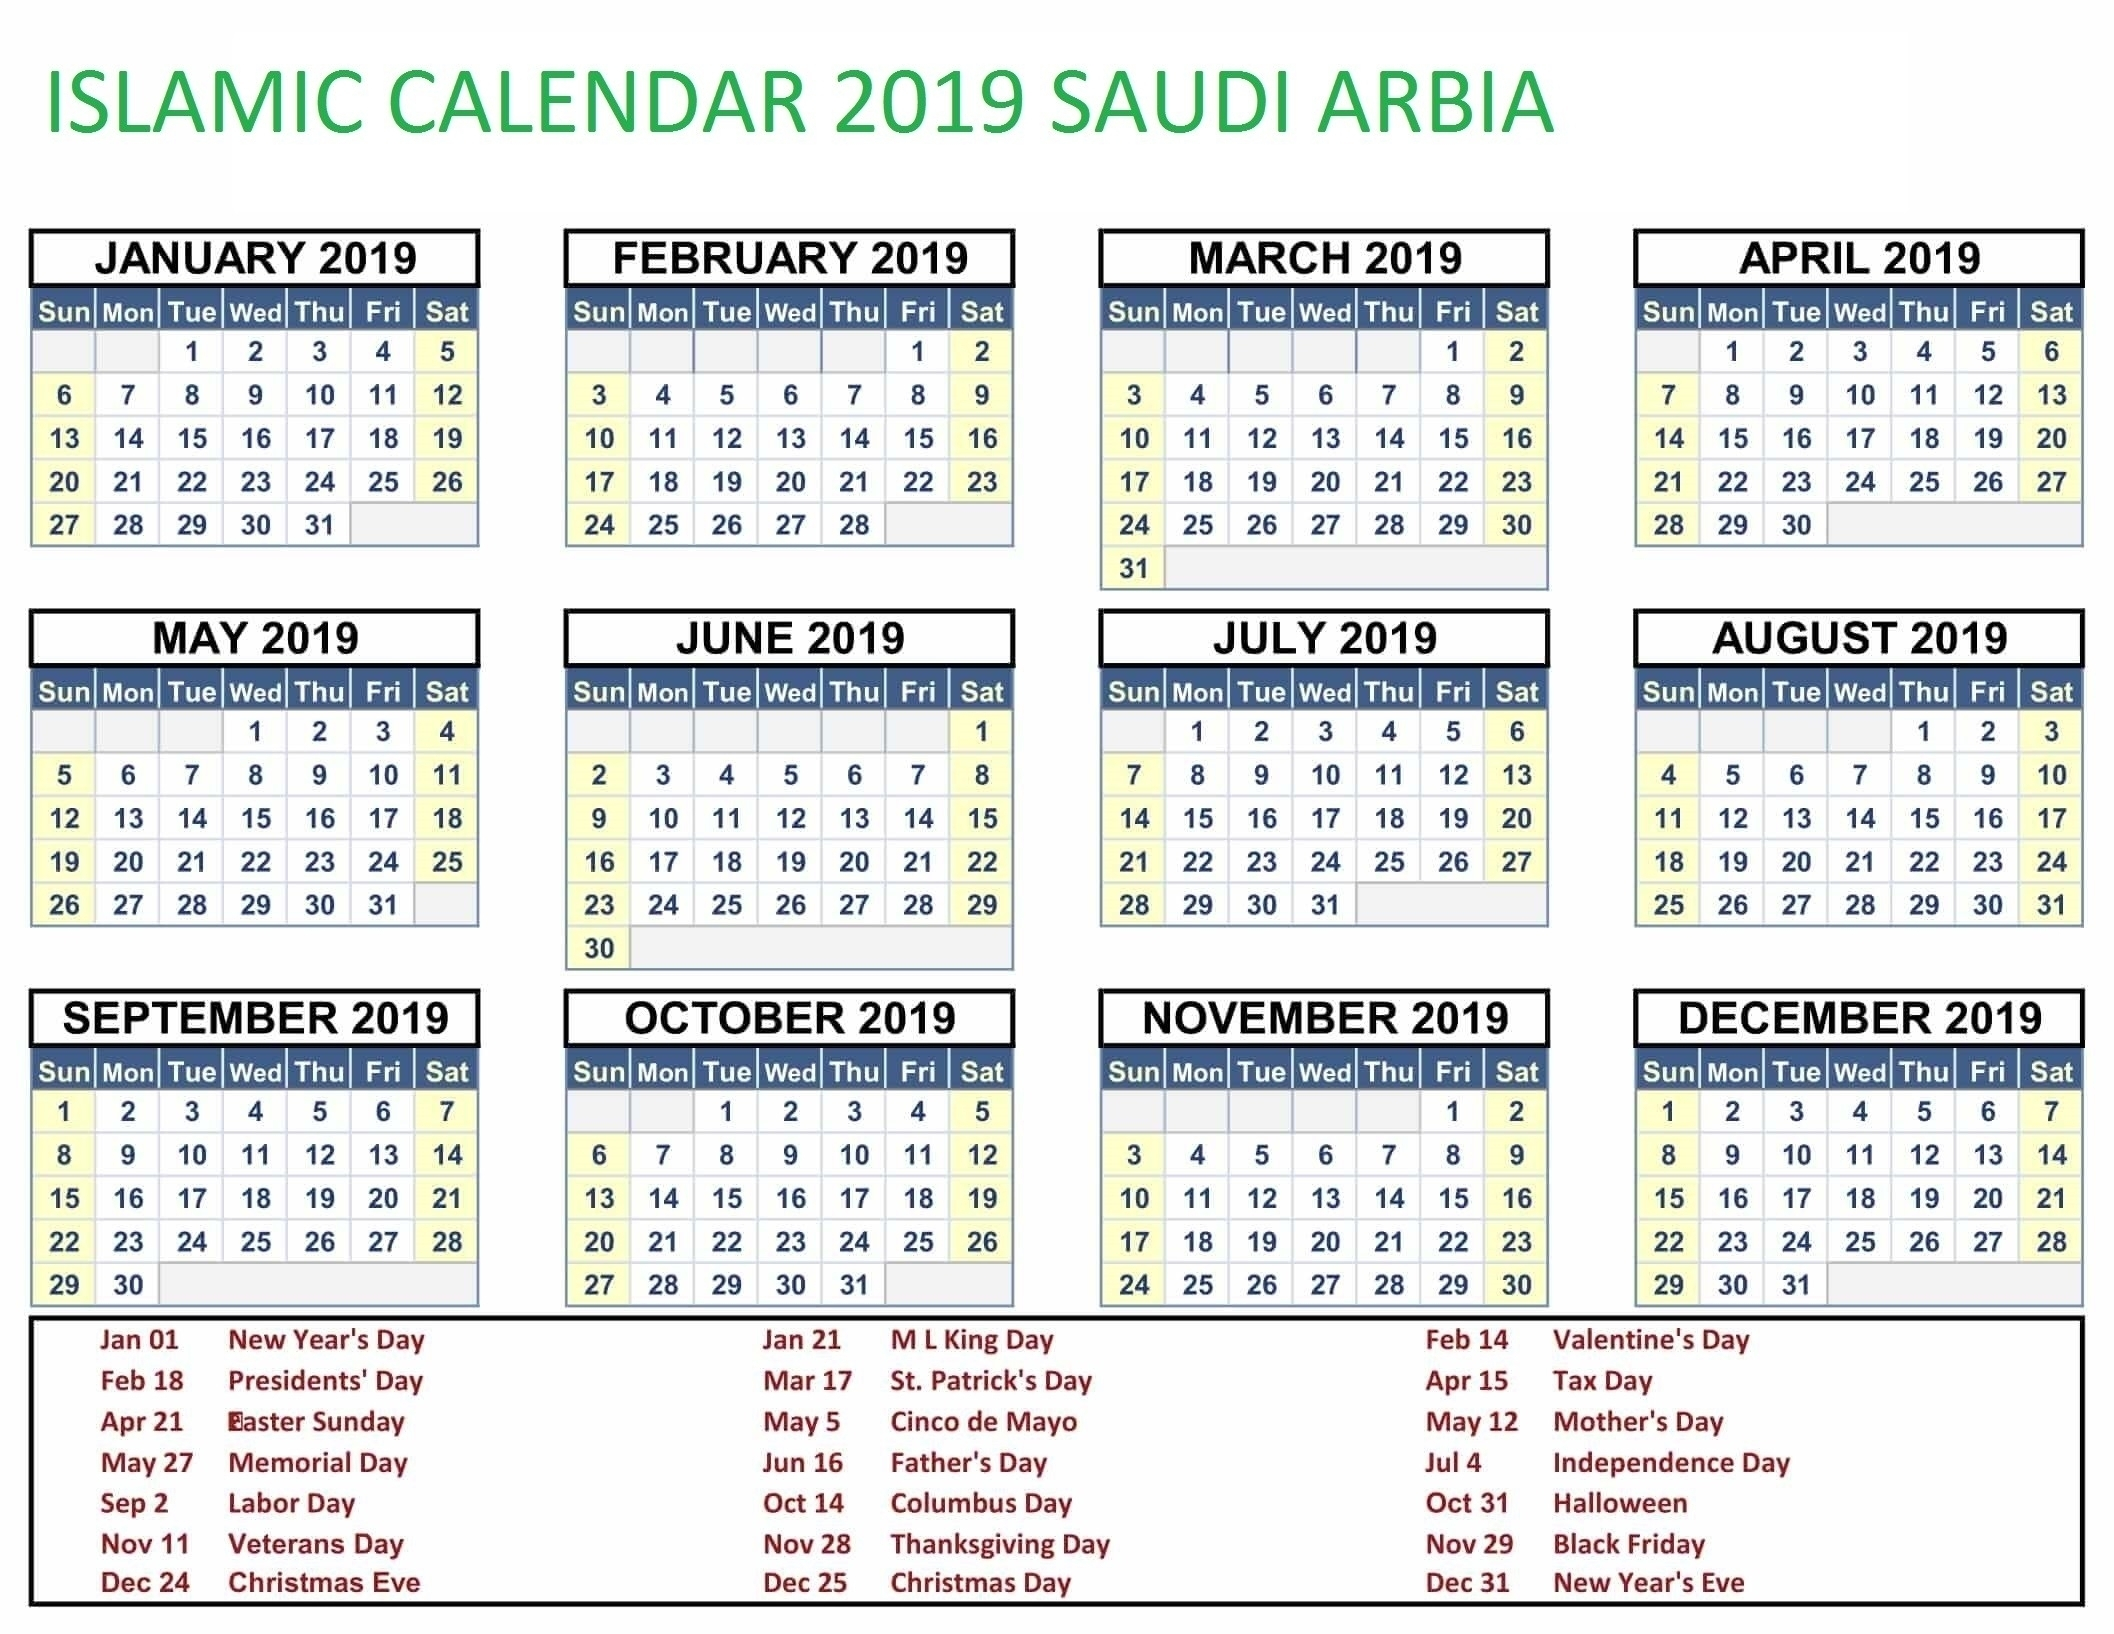 Saudi Islamic Month Kalendar Com | Template Calendar Printable regarding Islamic Calender In Saudi Arabia